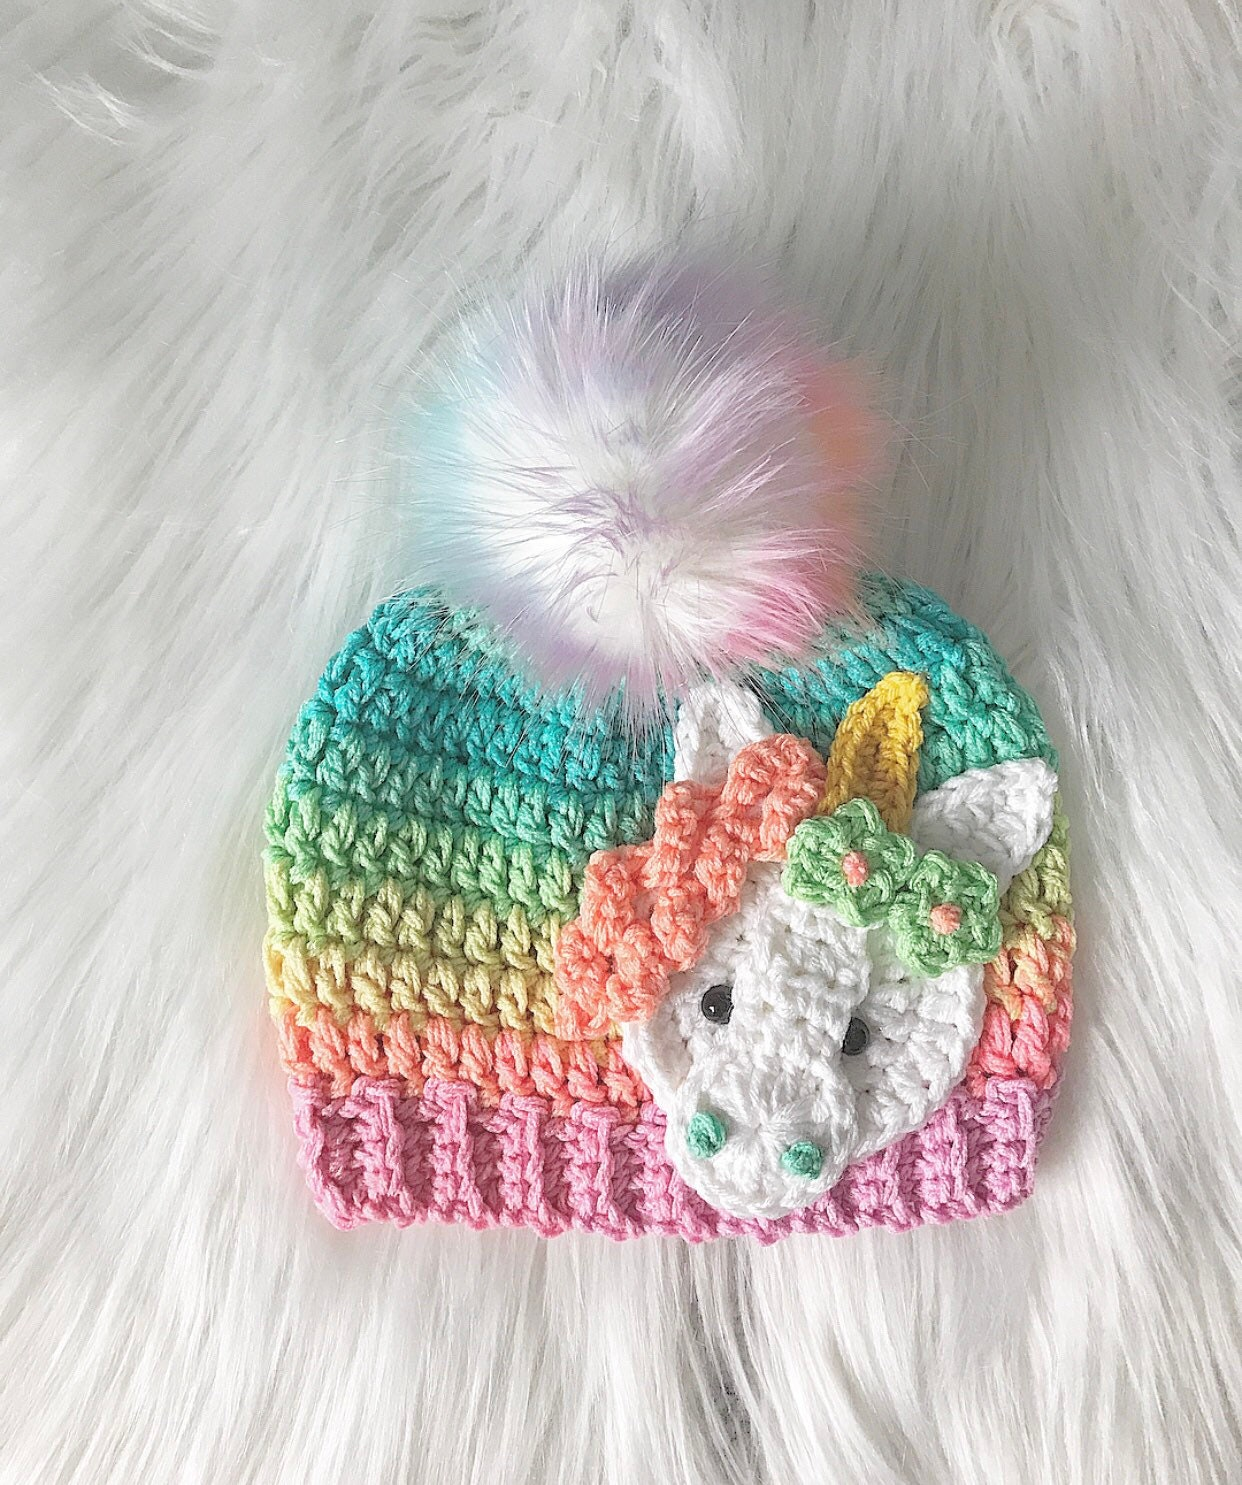 adda4f6093a24 Handmade Unicorn Beanie - Rainbow Unicorn Beanie - Unicorn - Beanie - Hat -  Ombre - Gifts for Her - Unicorn Hat - Unicorn Hats - Crochet